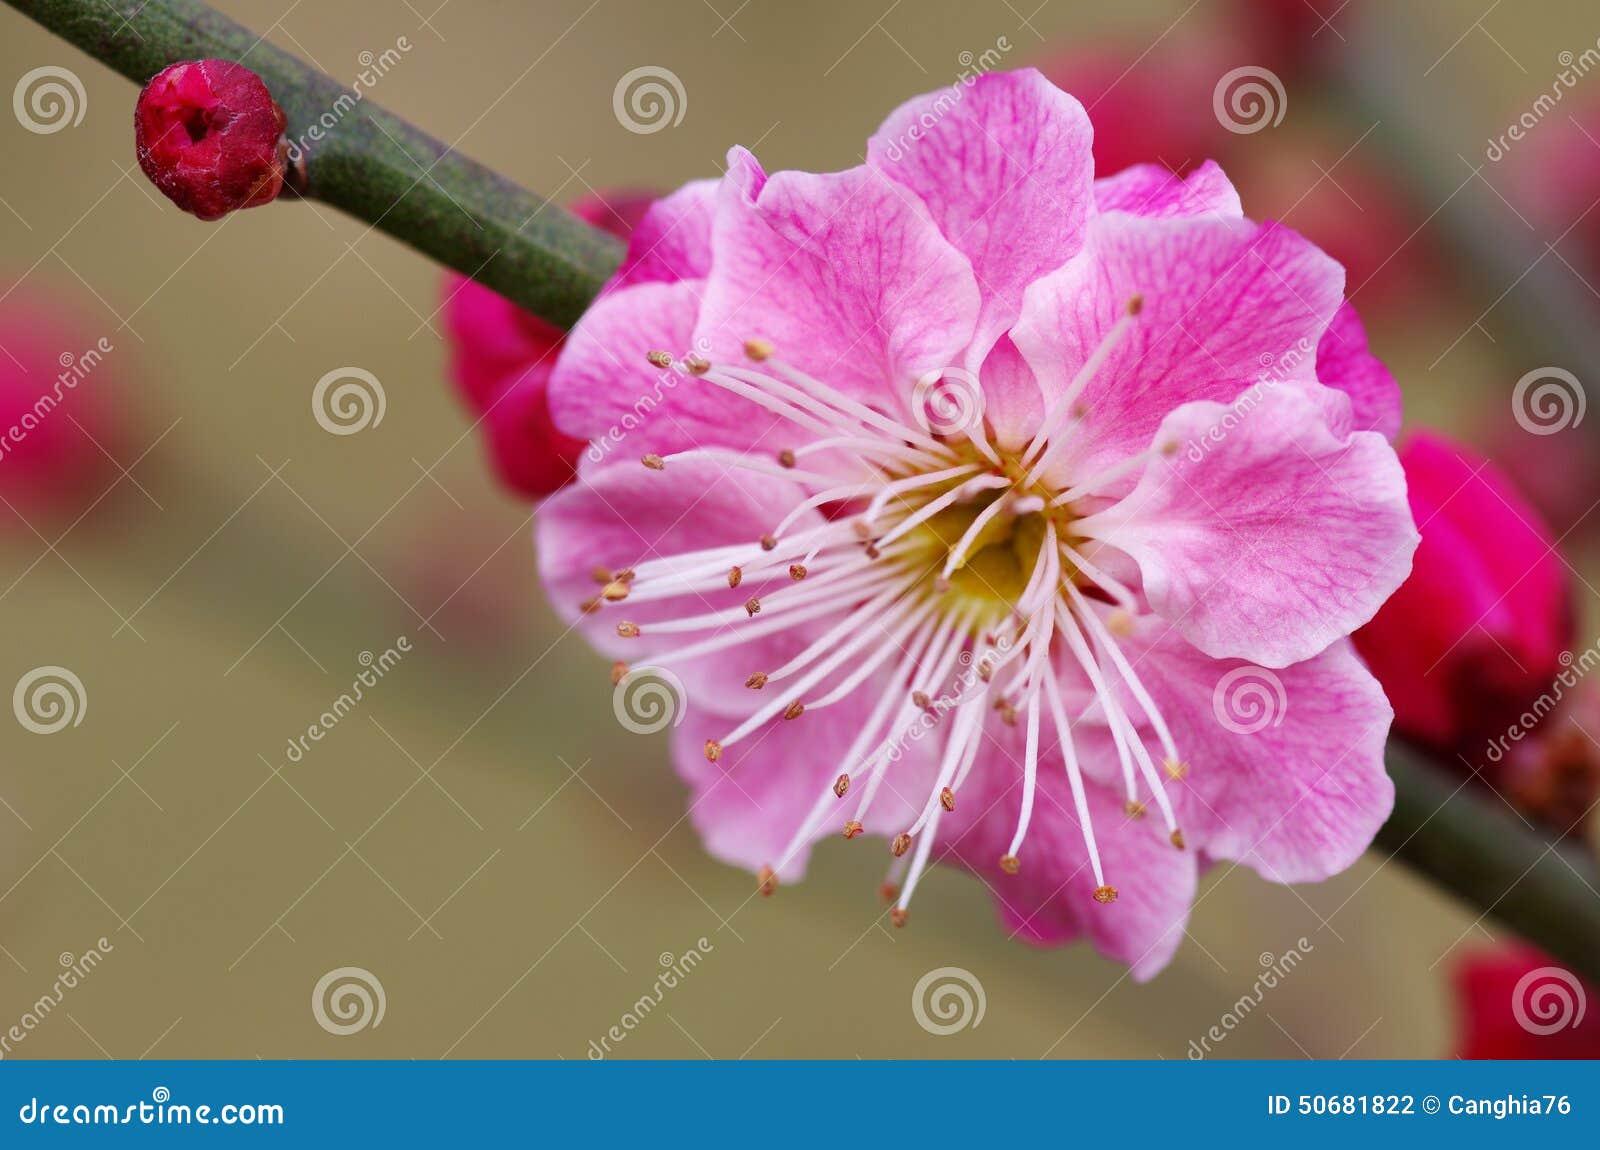 Download 李子花开花 库存照片. 图片 包括有 五颜六色, 粉红色, 空白, 自然, 格式, 工厂, 芬芳, 水平 - 50681822